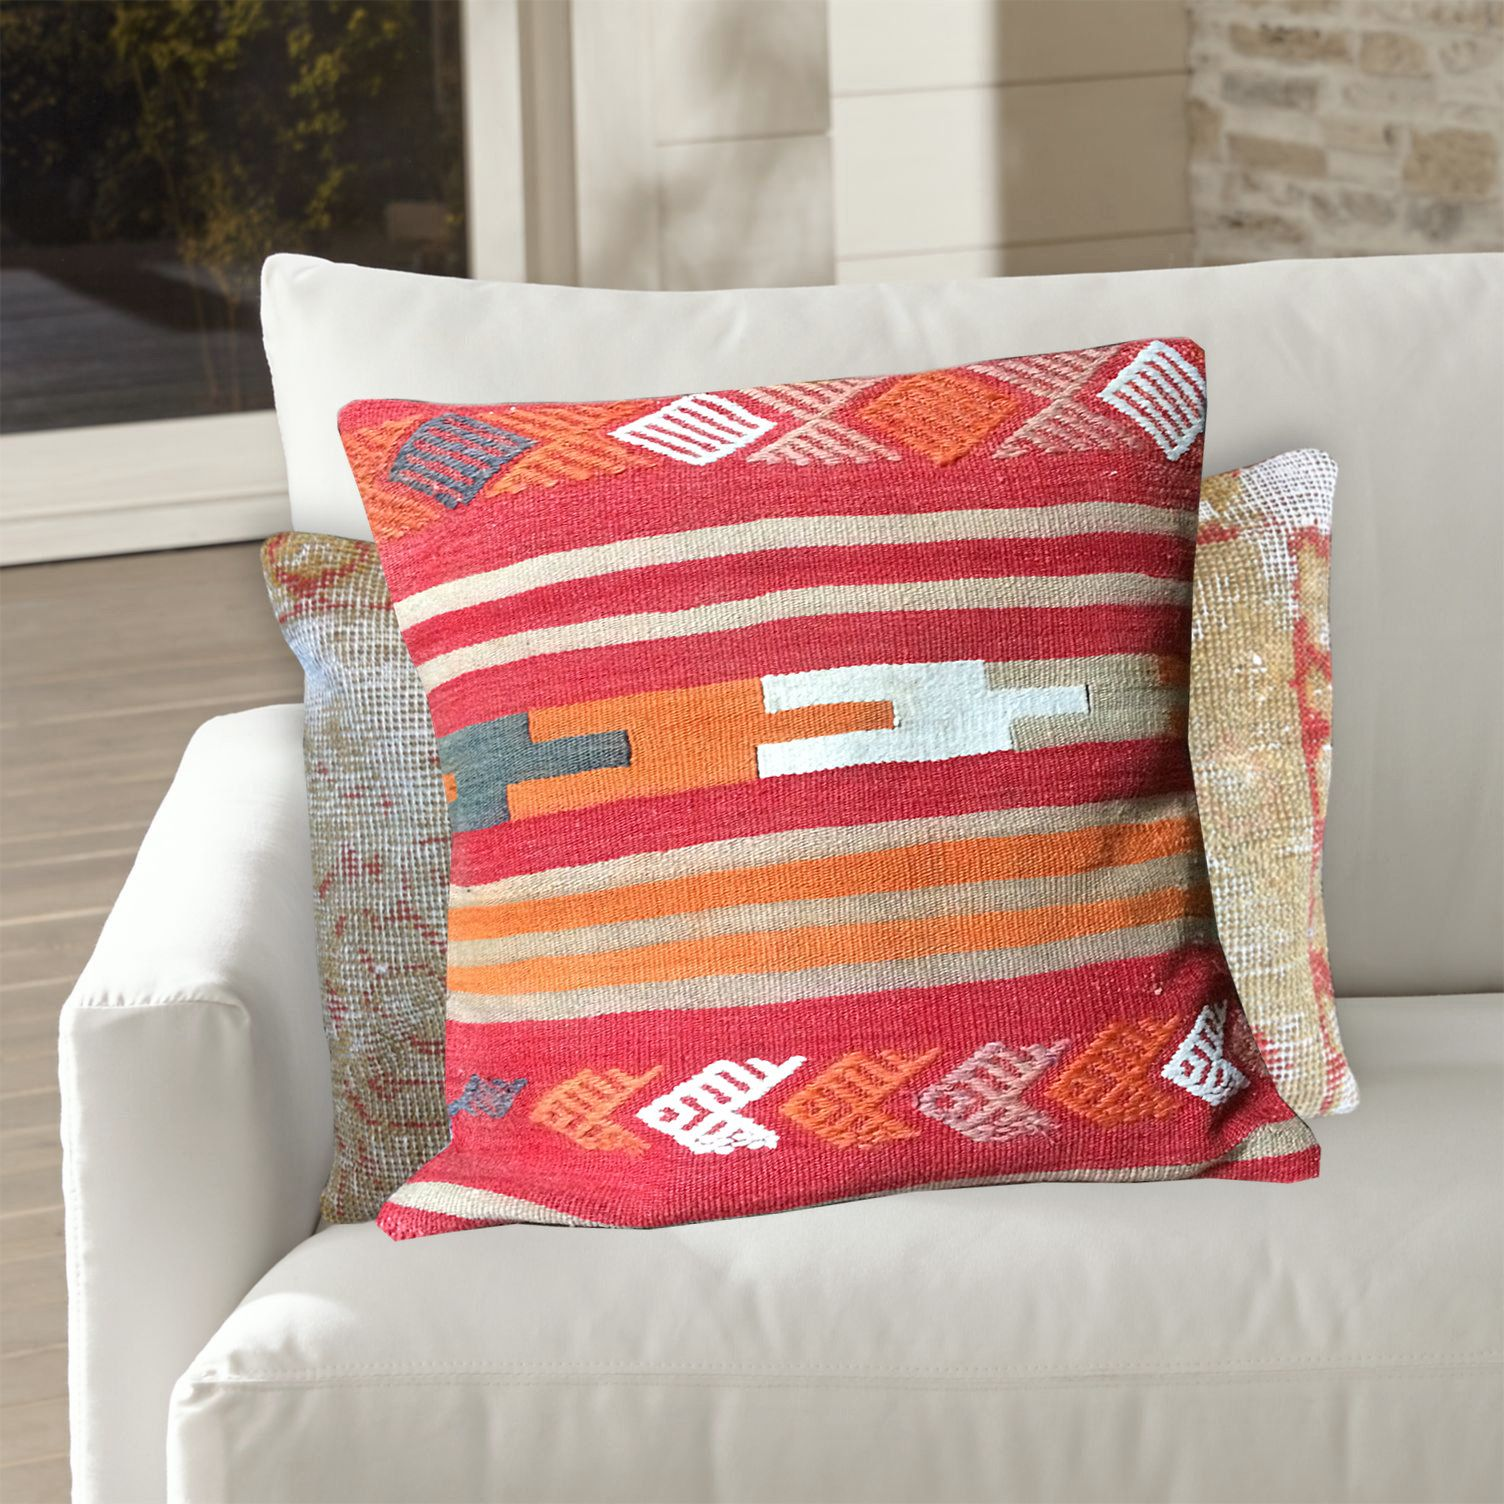 Gray Pink Orange Decorative Throw Pillow Covers 20x20 Wool Sofa